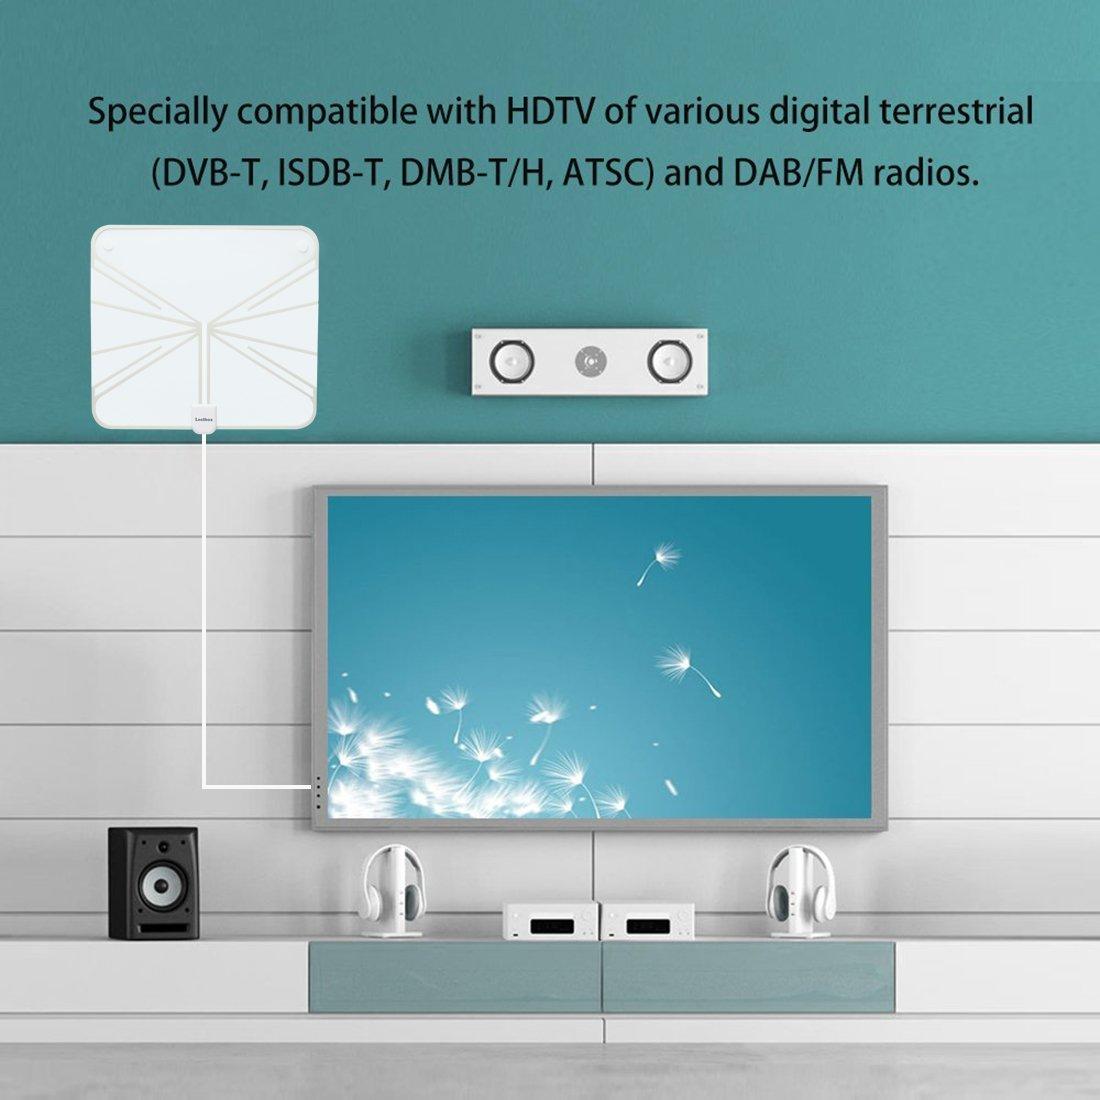 Amazon.com: Leelbox HDTV Antenna 60 Miles Range Digital 4K/Full HD ...